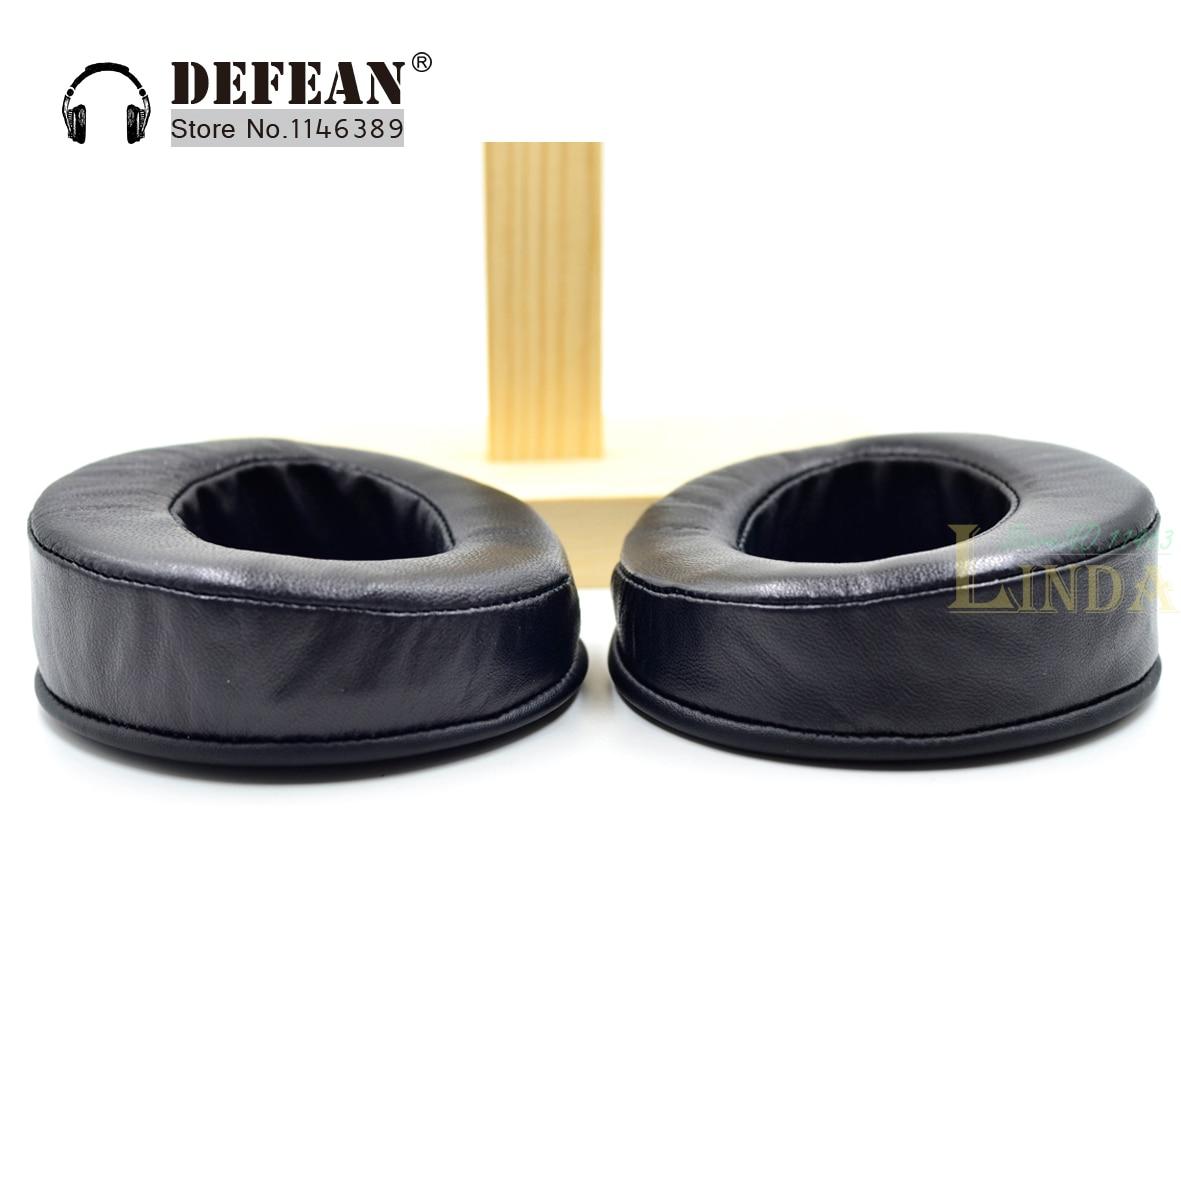 Angle Genuine Leather cushion ear pads foam ear pads cover for Hifiman HE Series Headphones headset